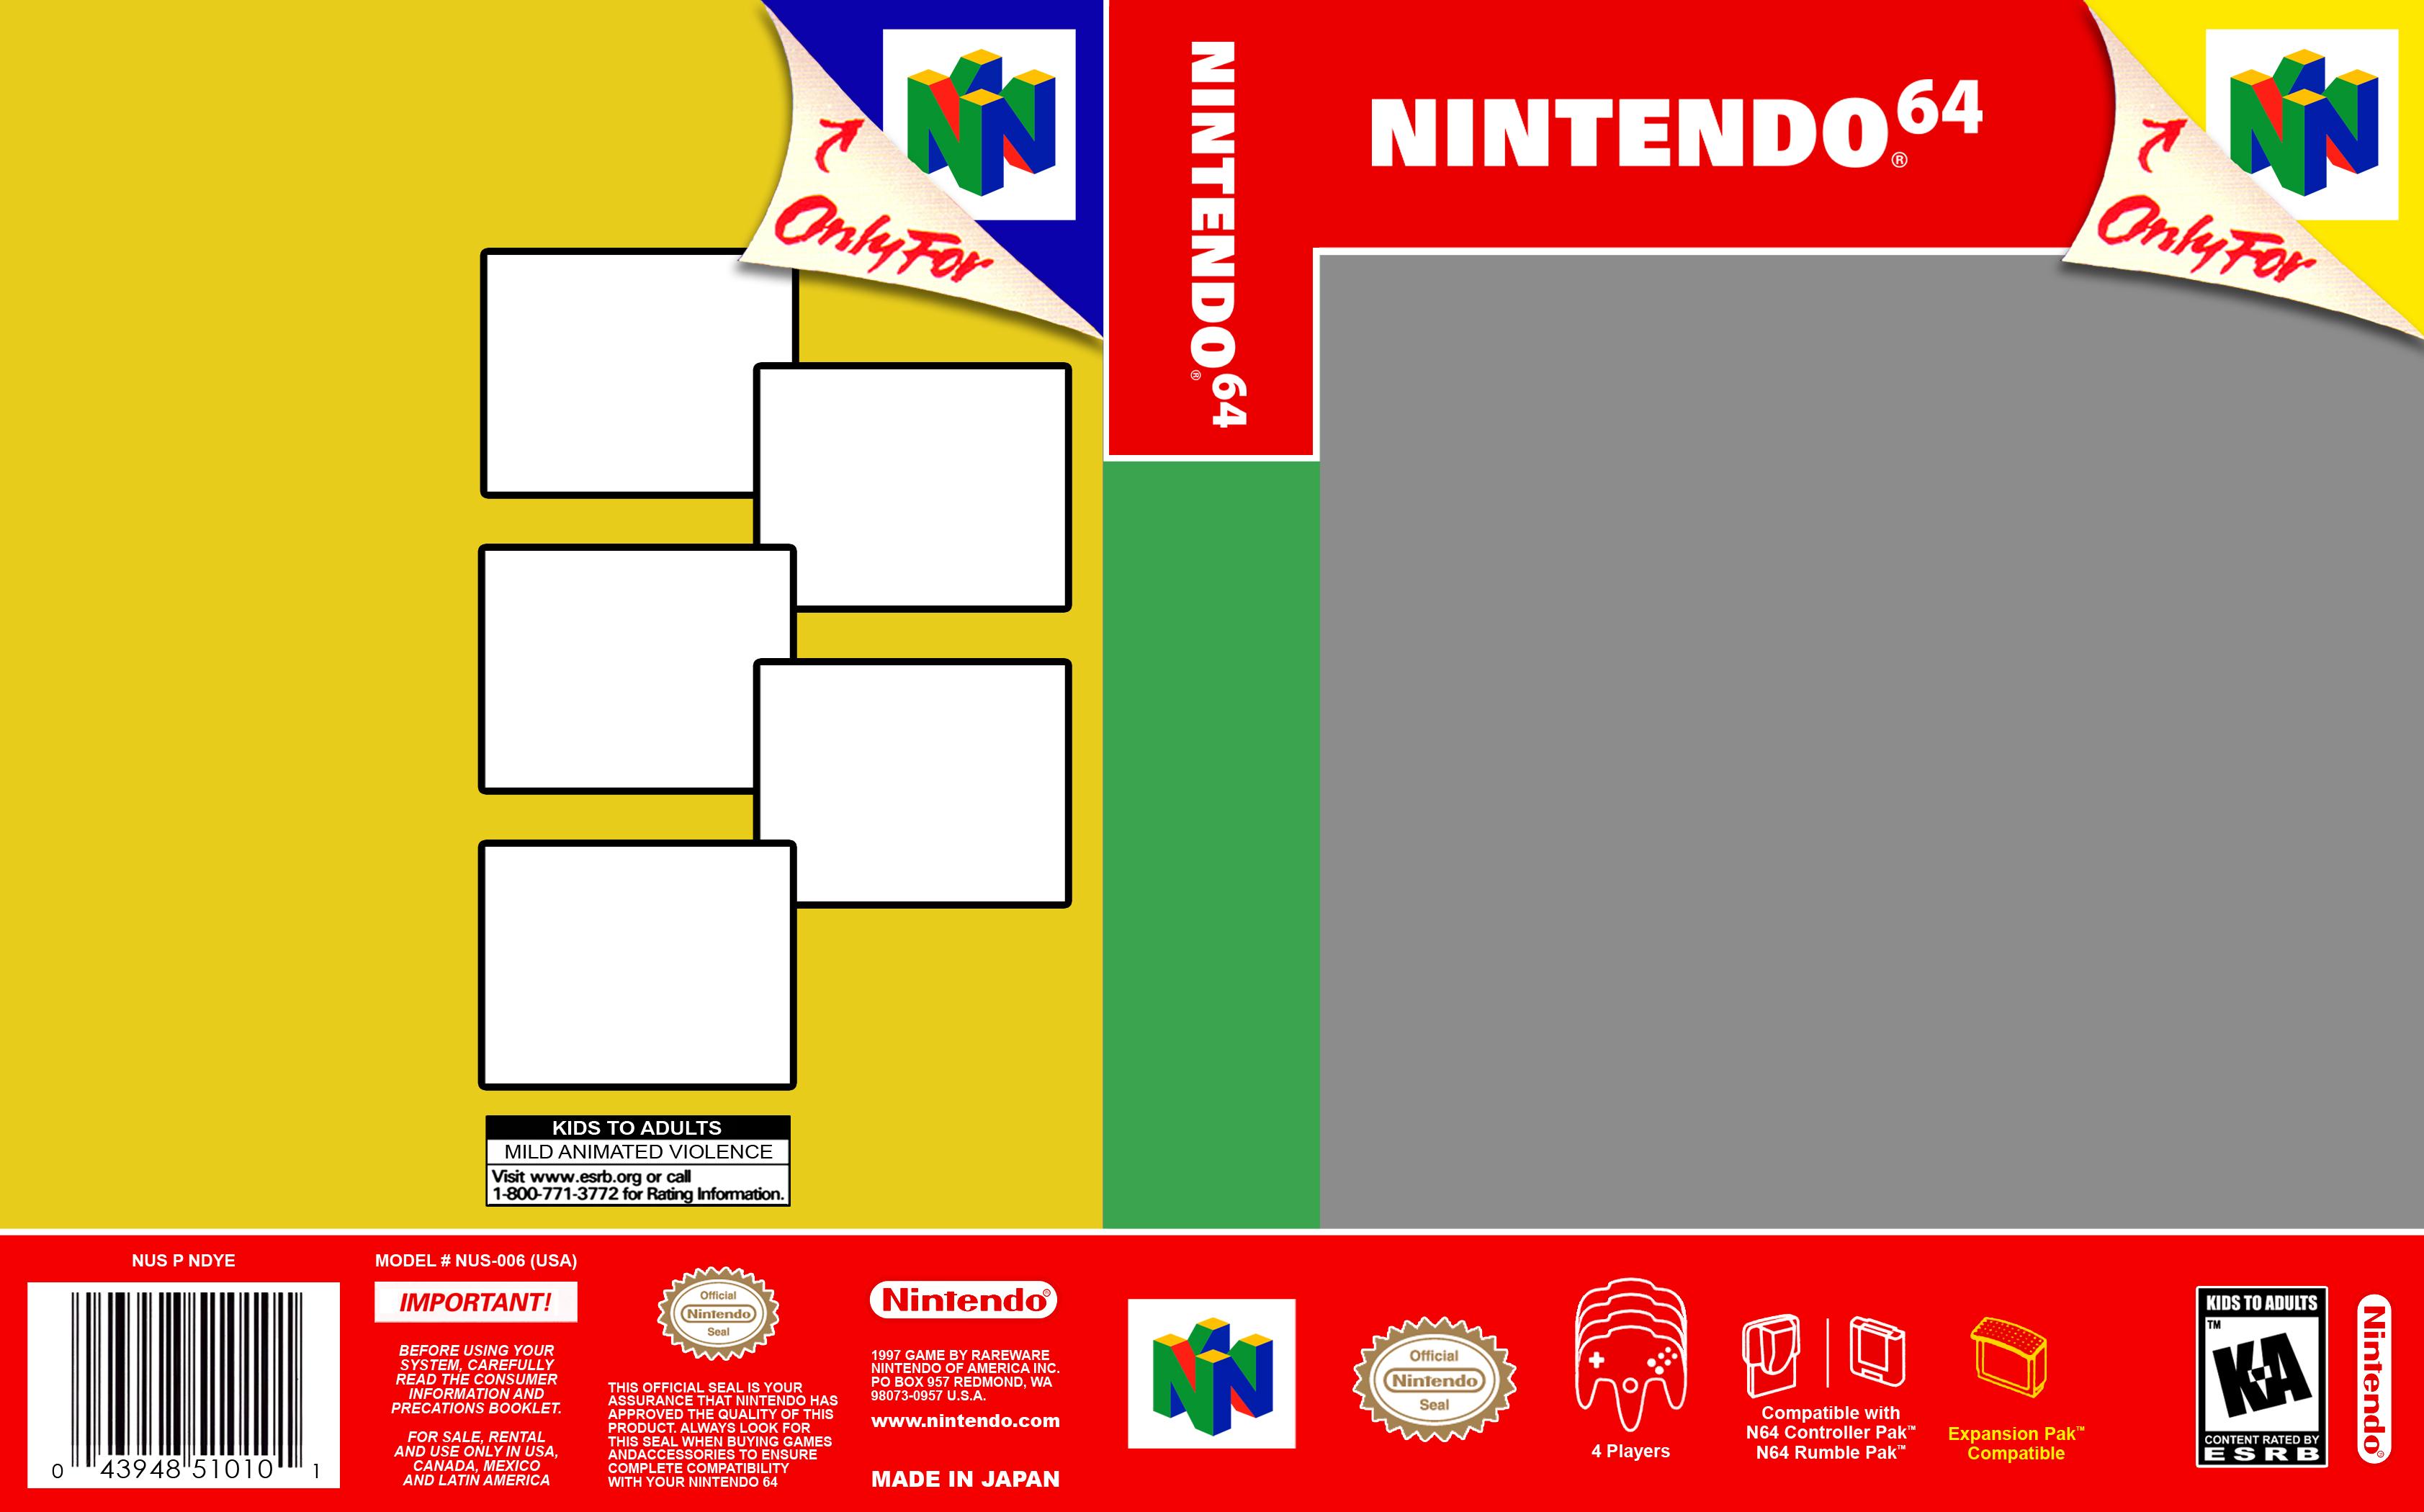 Details about Judge Dredd SNES Super Nintendo Game Case Box Cover Brand New  Pro Quality!!!